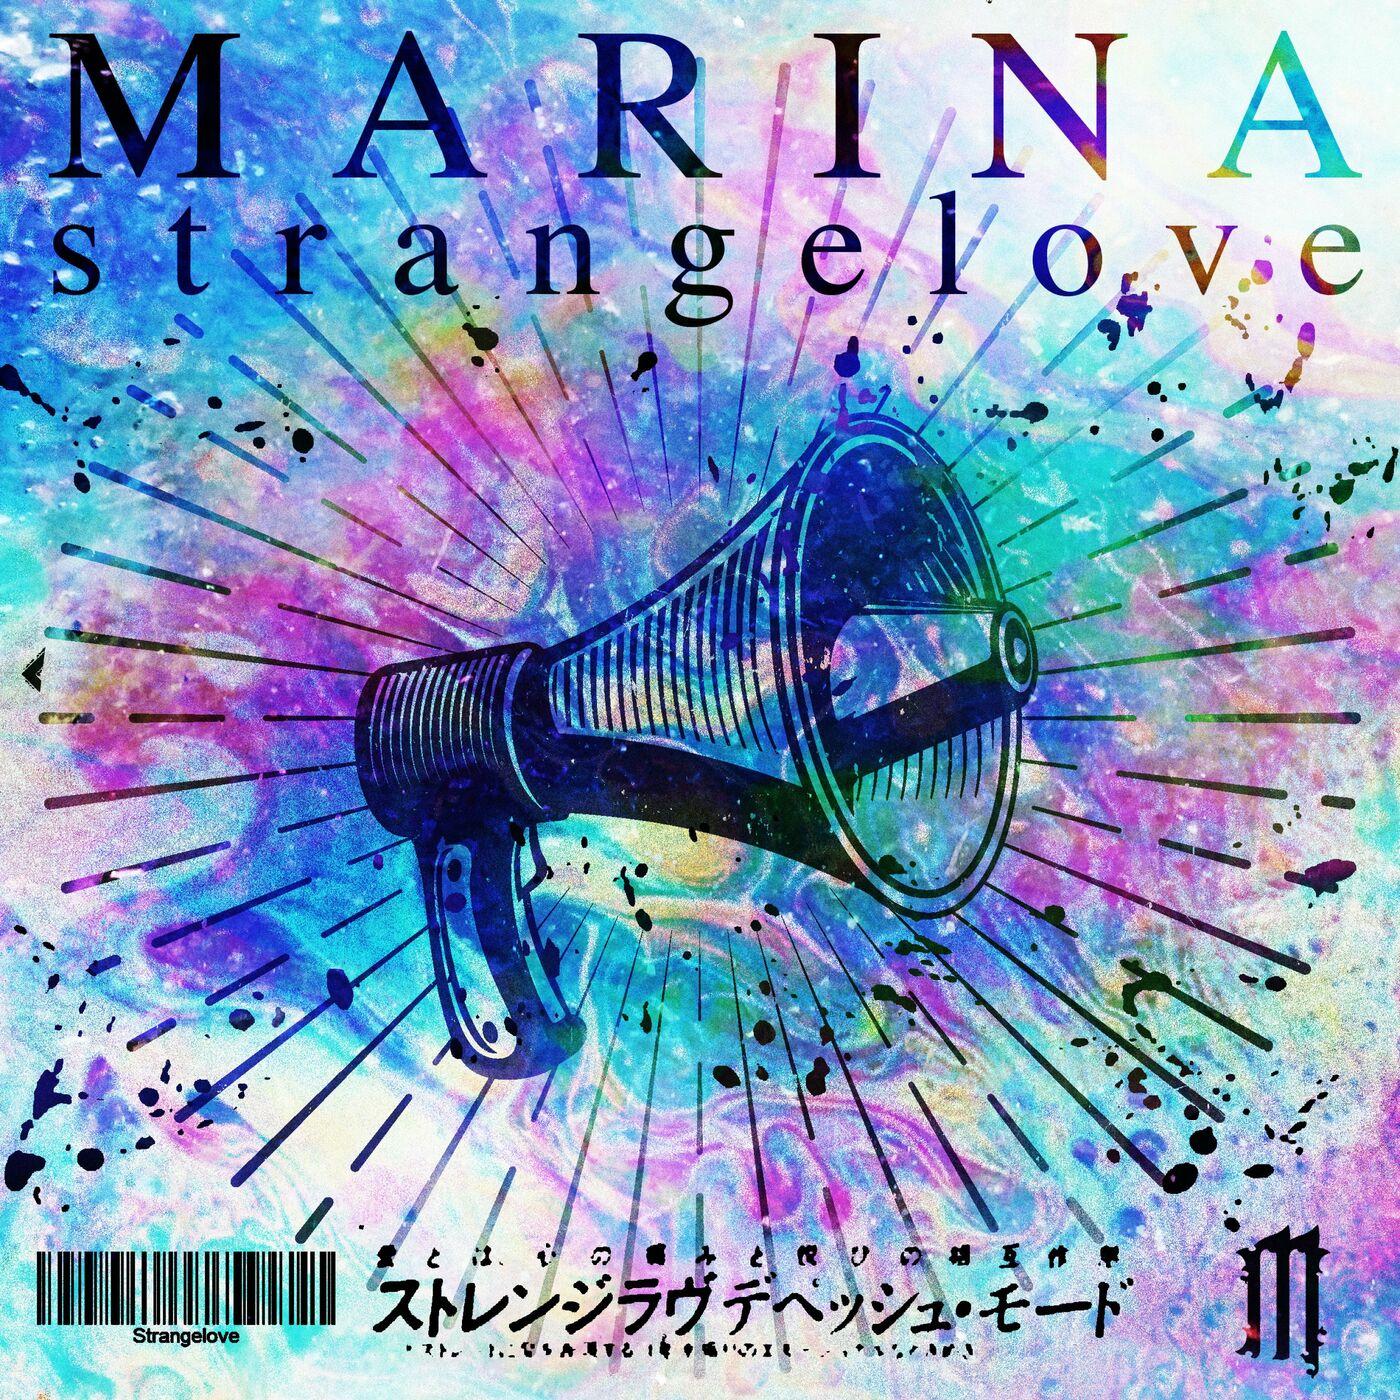 Marina - Strangelove [single] (2020)